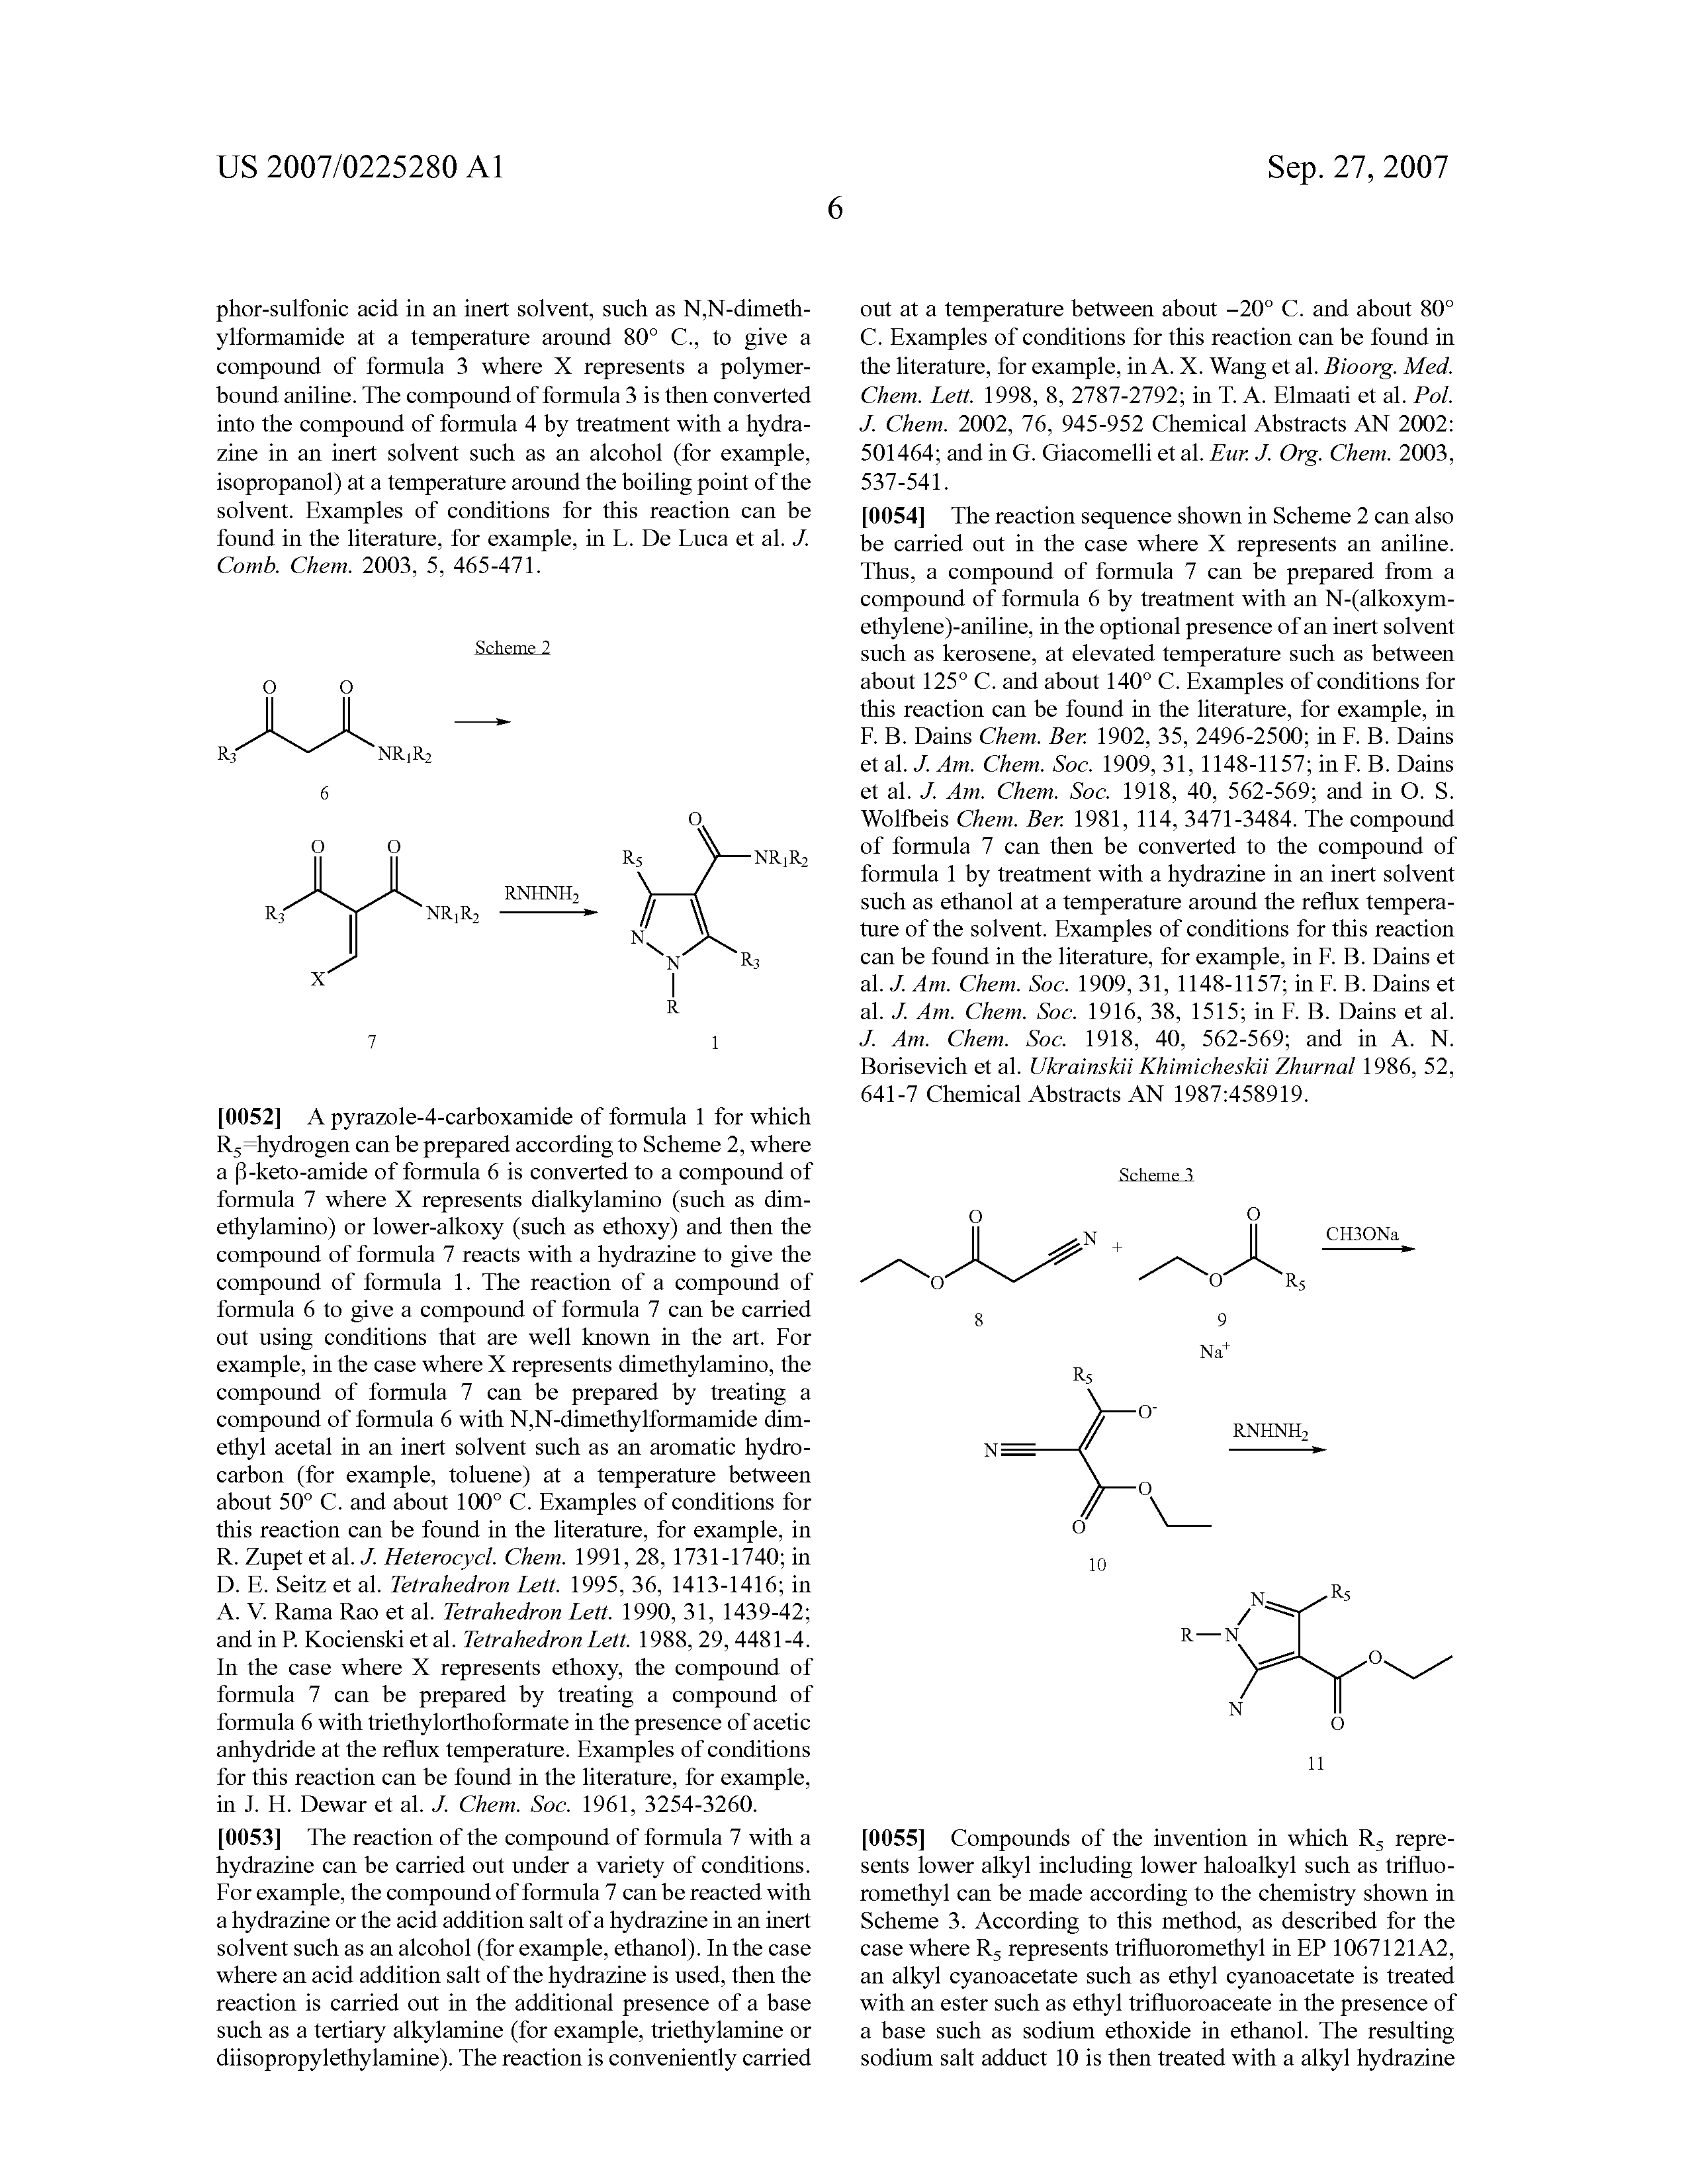 11b-hydroxysteroid dehydrogenase inhibitor